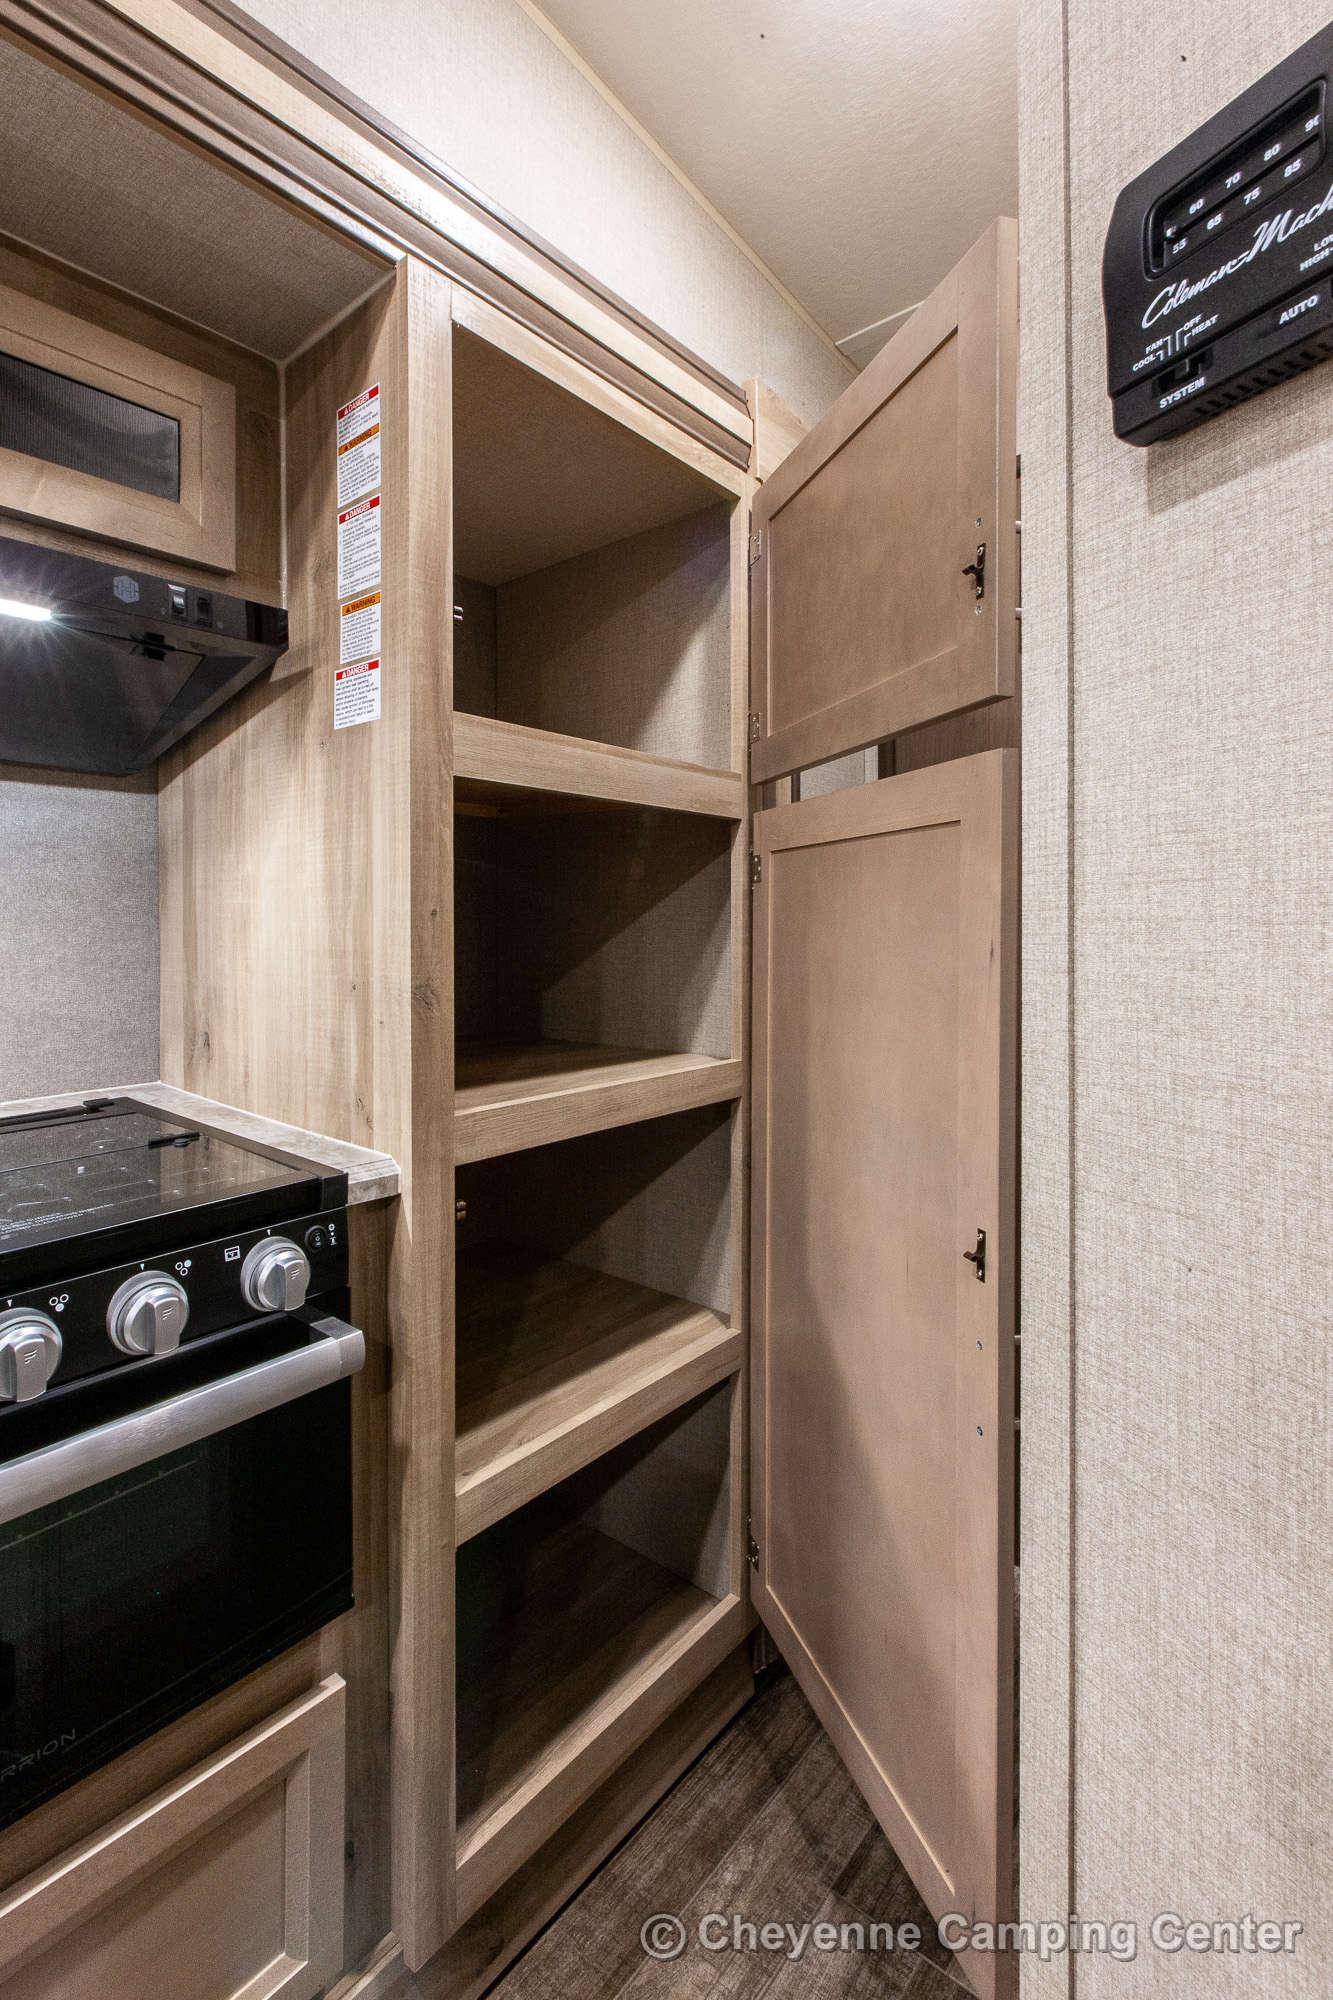 2021 Coachmen Catalina Trail Blazer 30THS Bunkhouse Toy Hauler Travel Trailer Interior Image